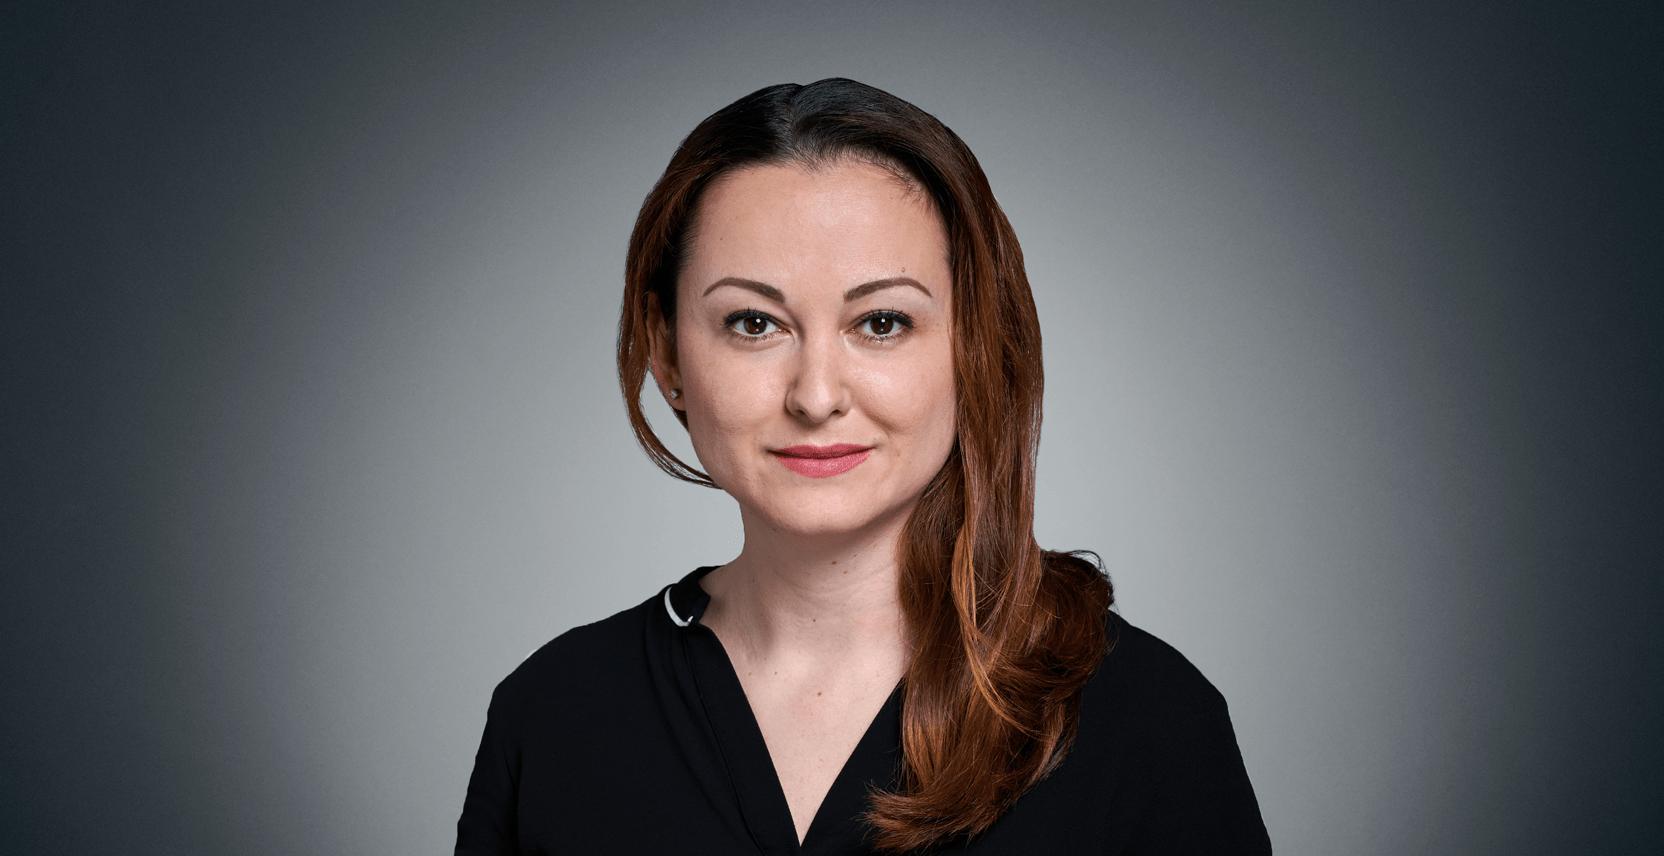 Cecile Roulet-Veli